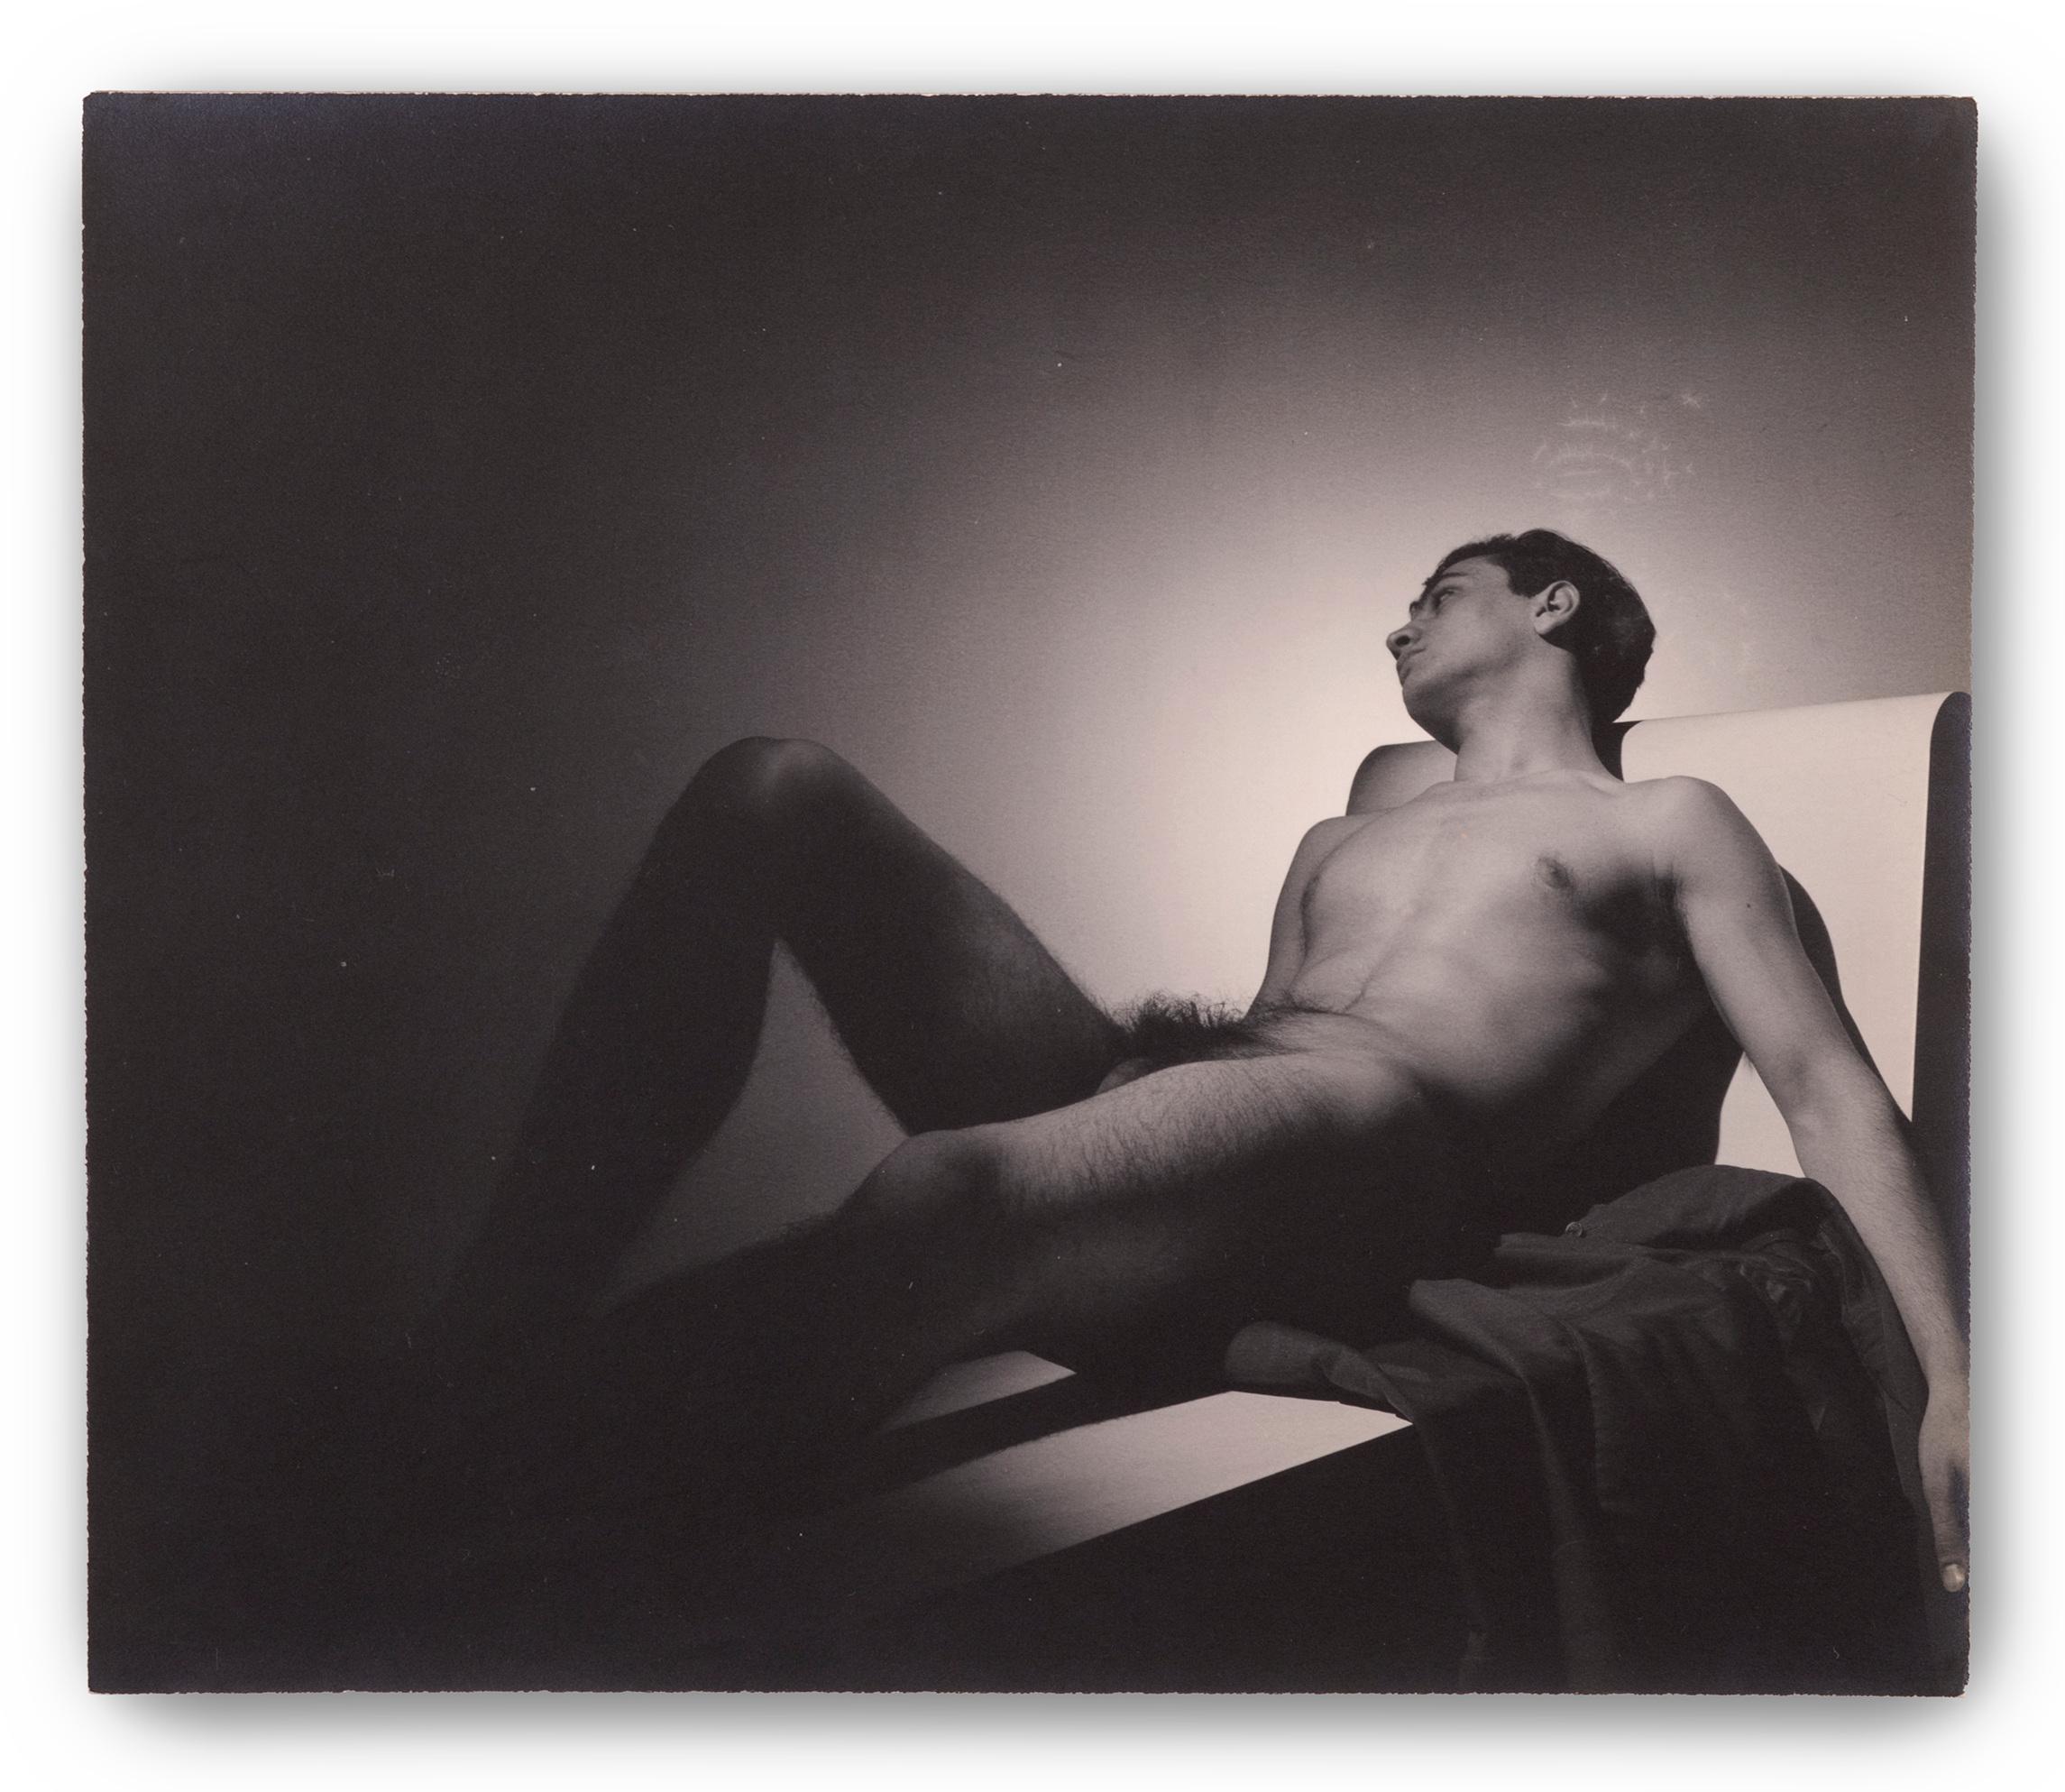 George Platt Lynes, (American 1907-1955), Reclining Nude (Mark Pagano), 1944.